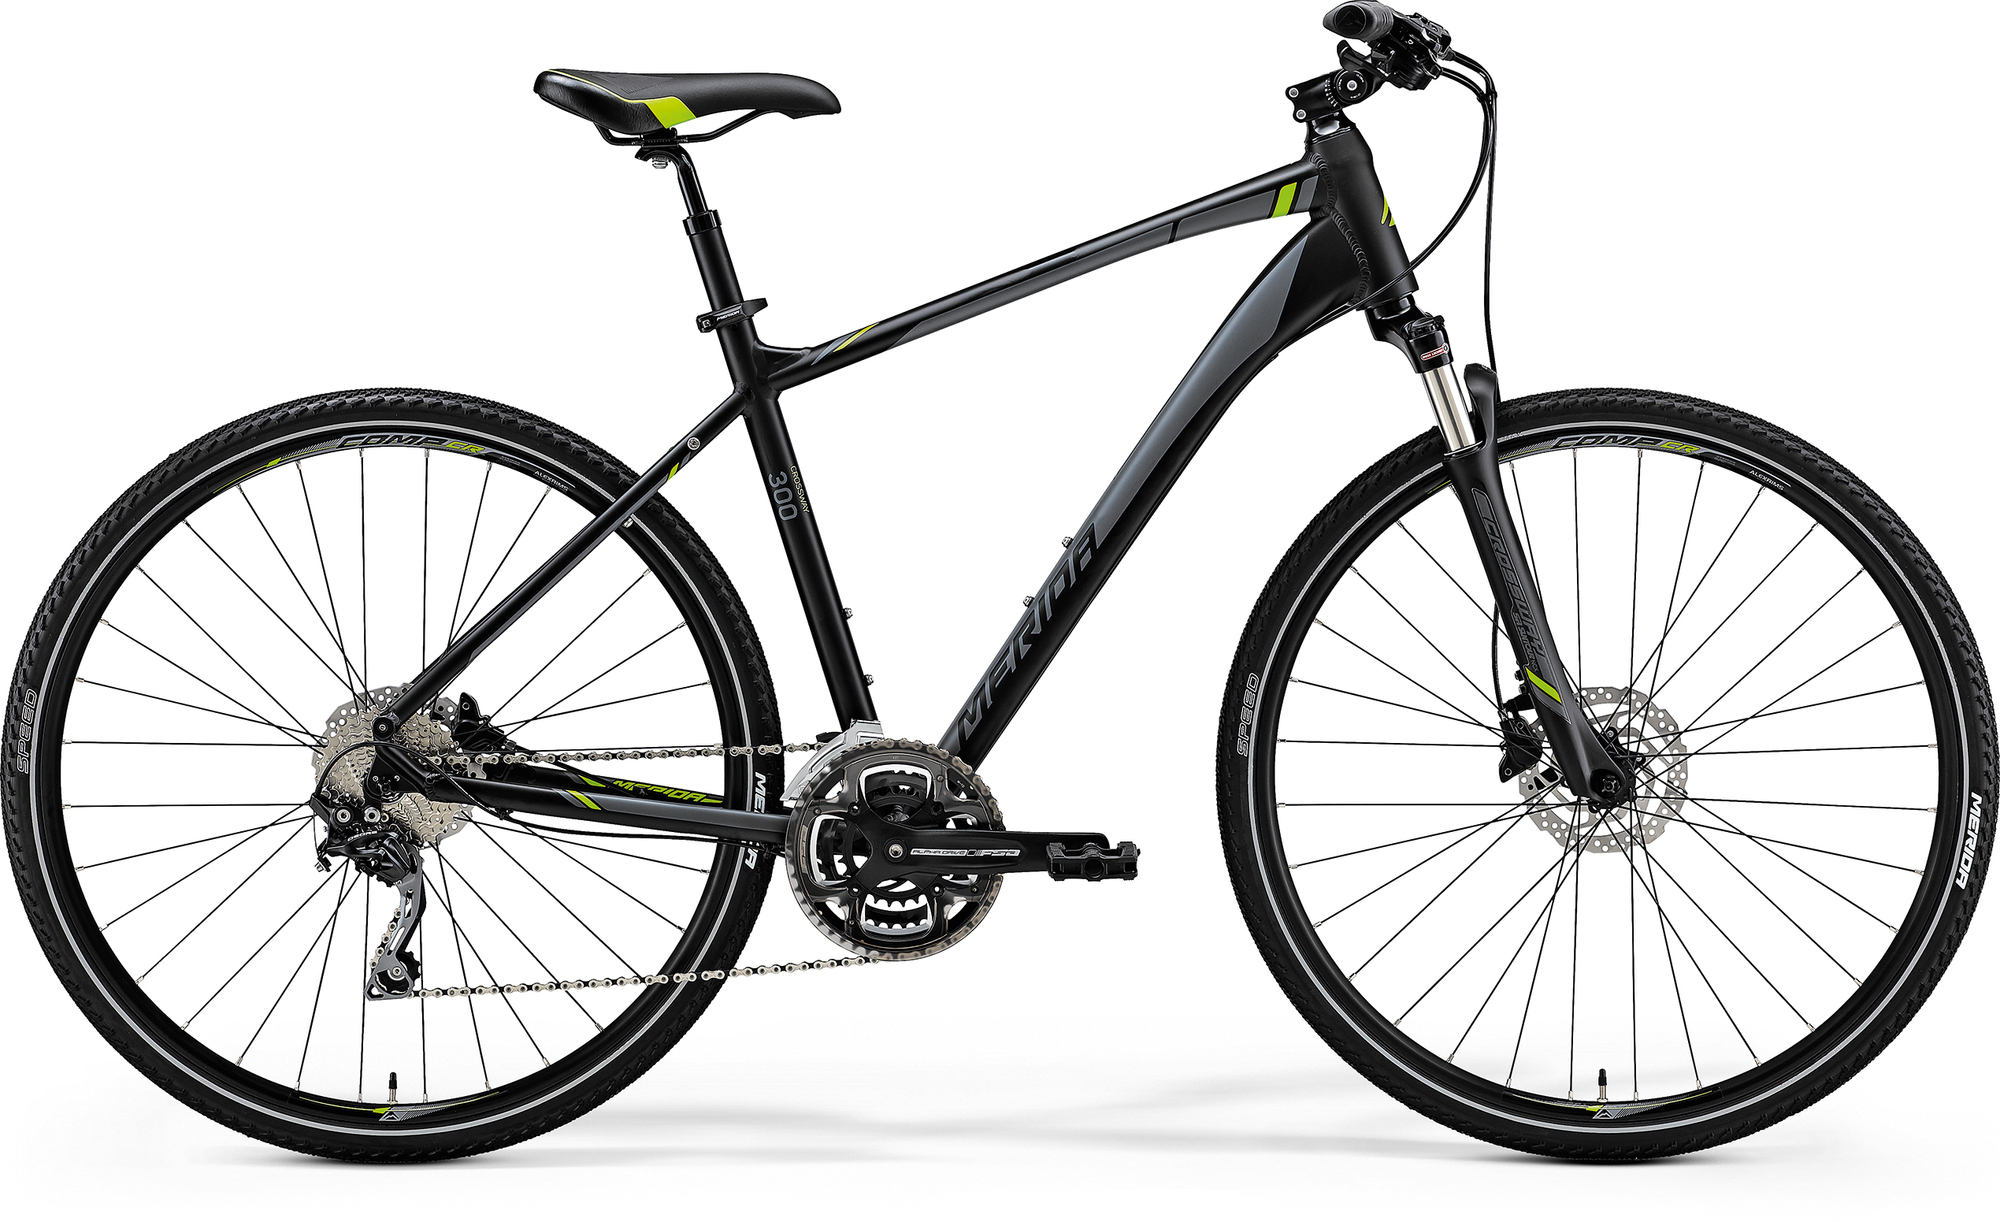 Merida-Crossway-300-2018-Belhaven-Bikes-Dunbar-East-Lothian-Hybrid-Bikes